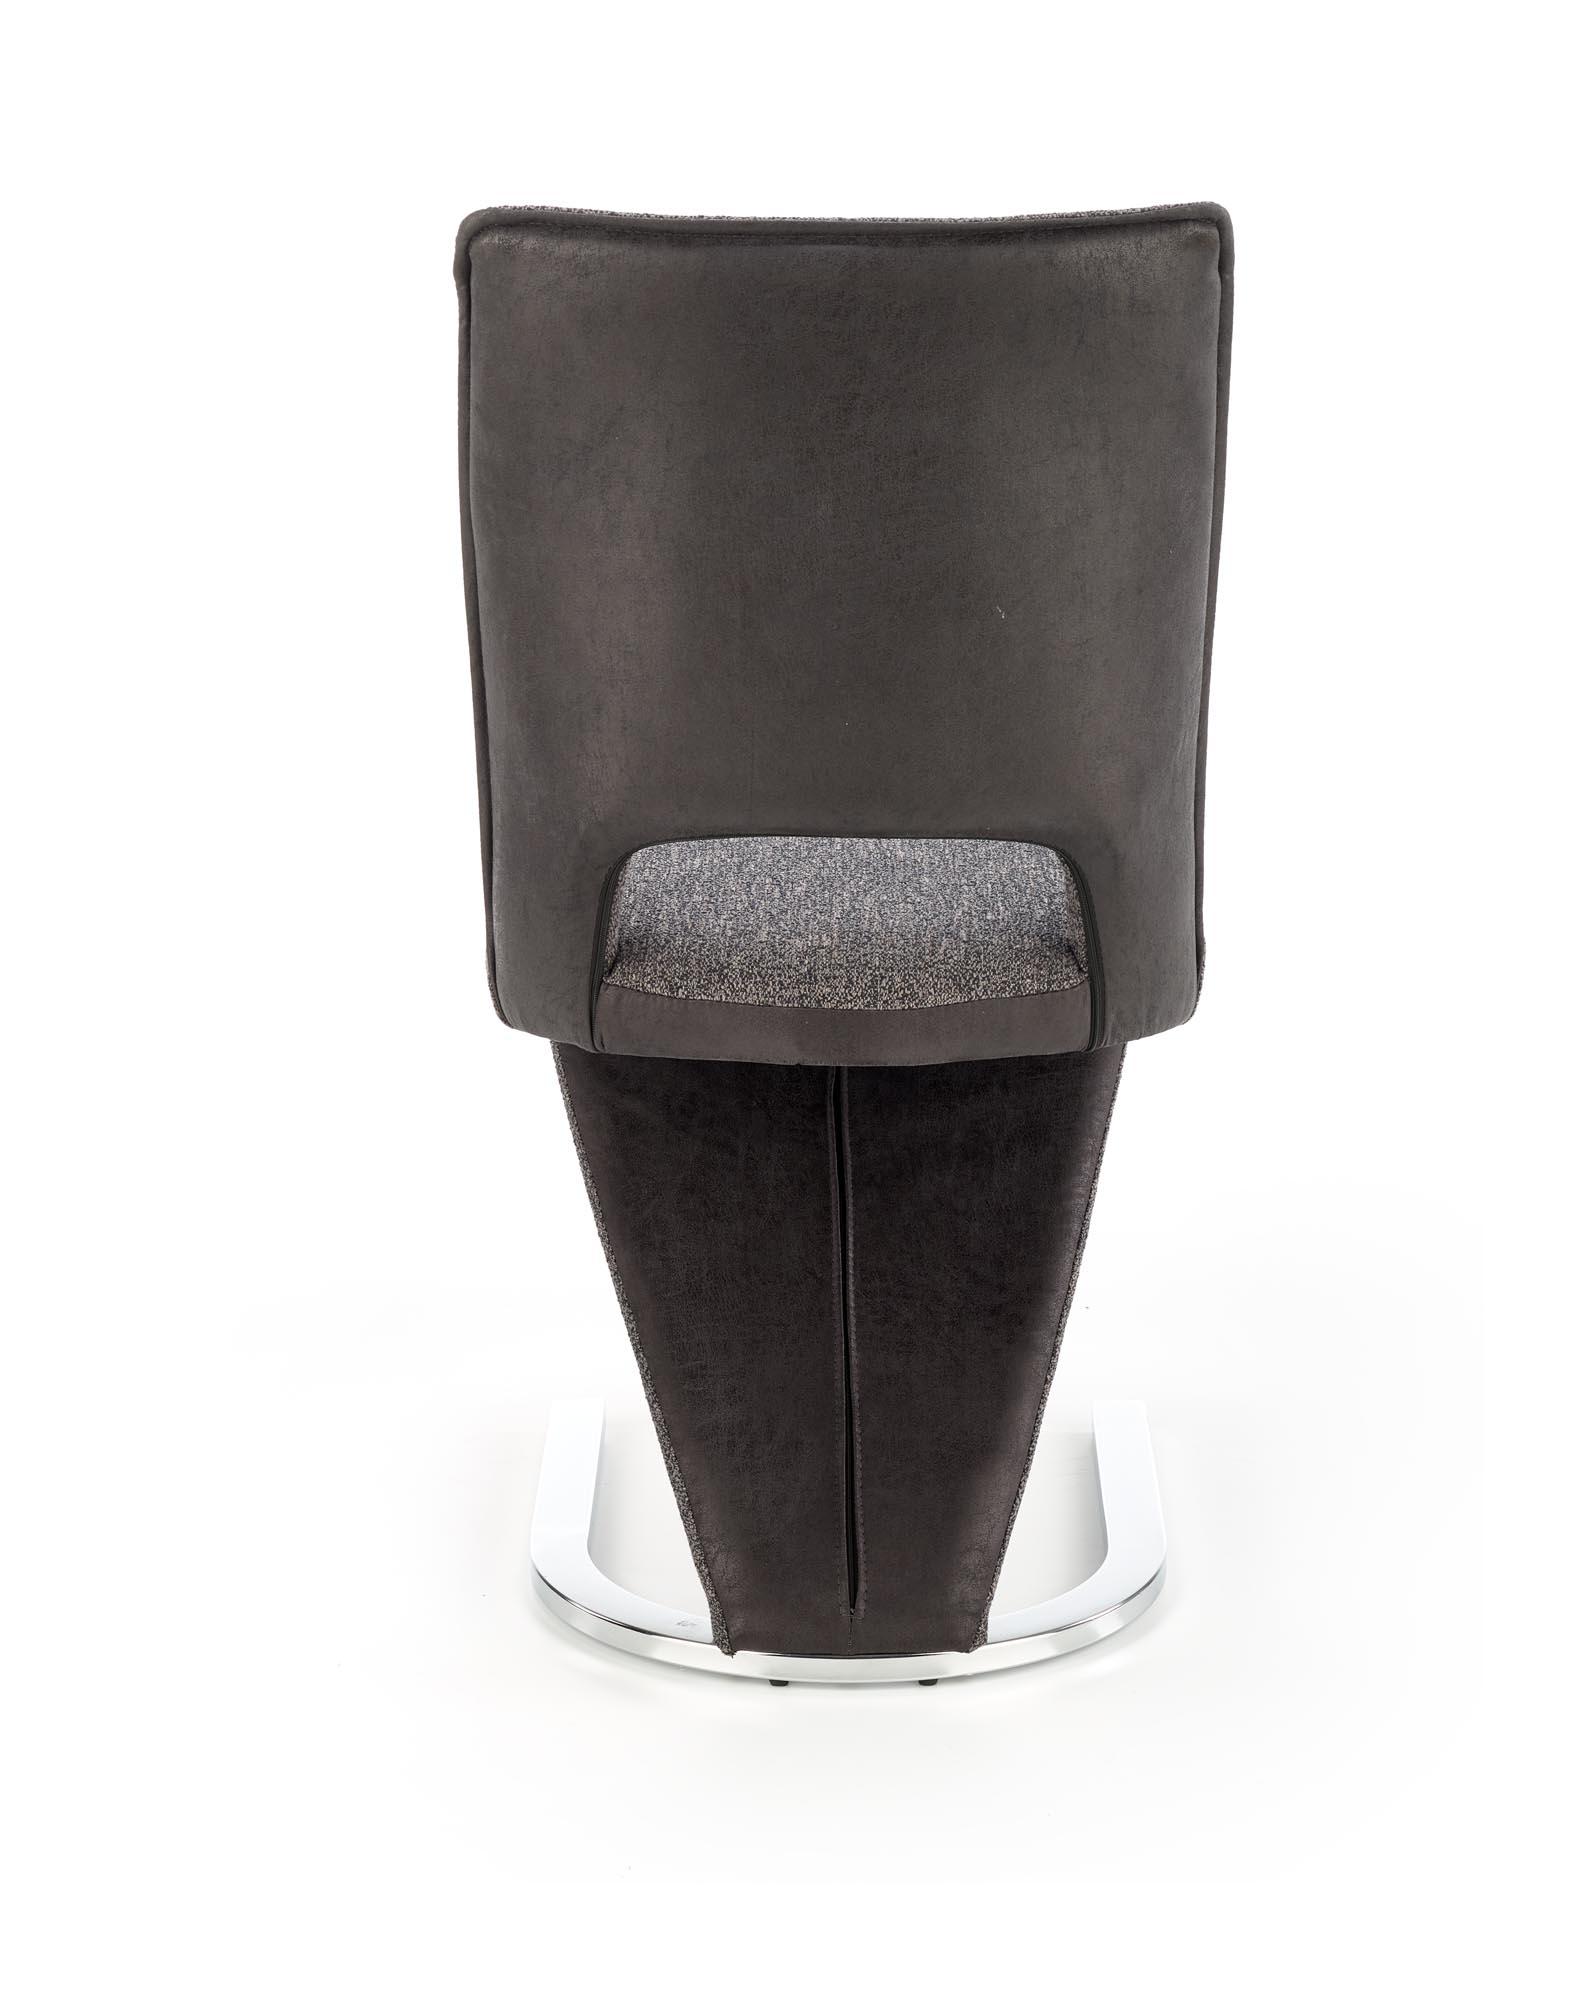 K441 stolička šedá/čierna